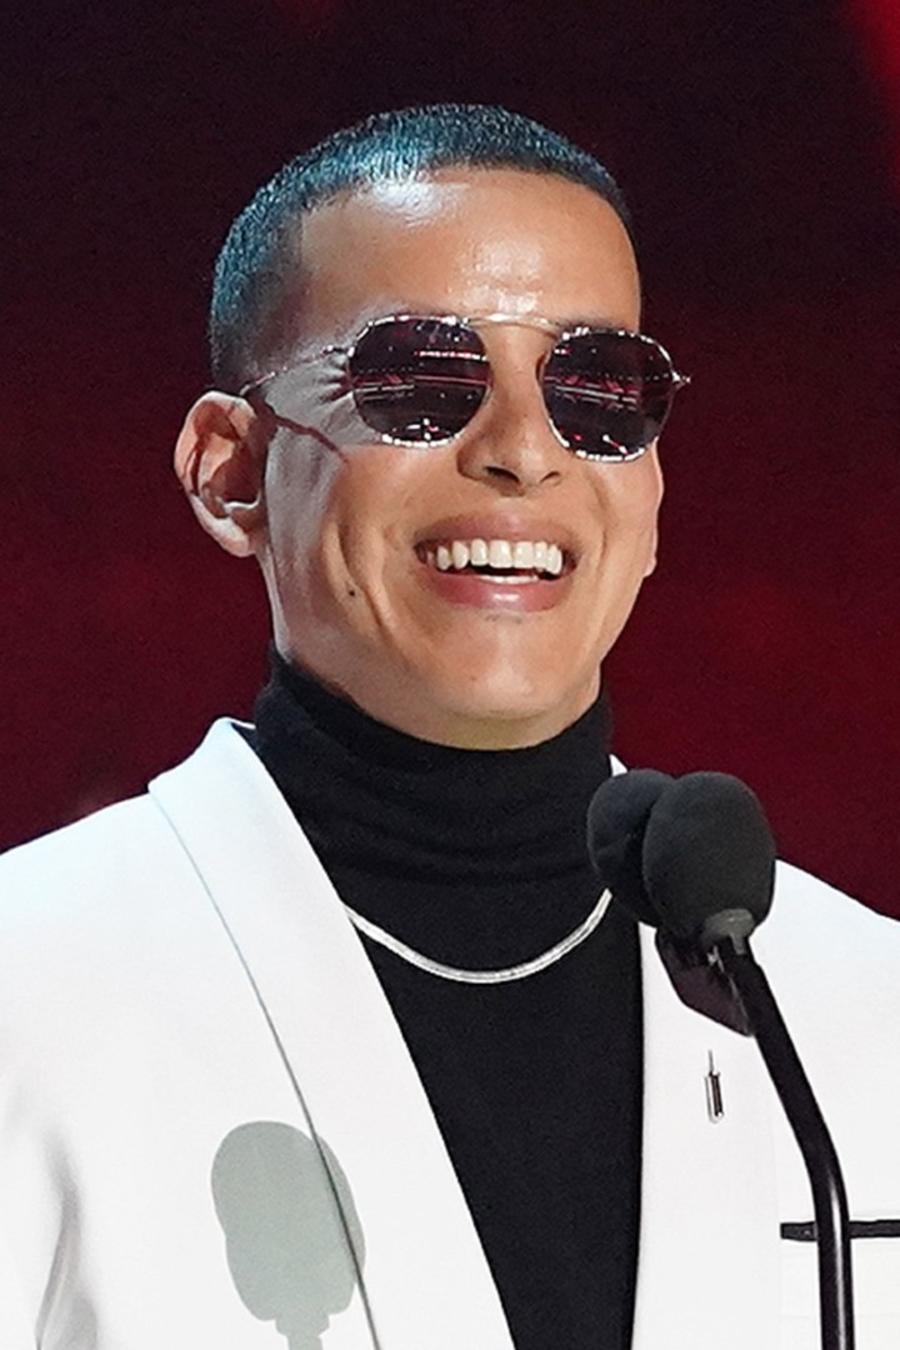 Daddy Yankee en Premios Billboard 2020